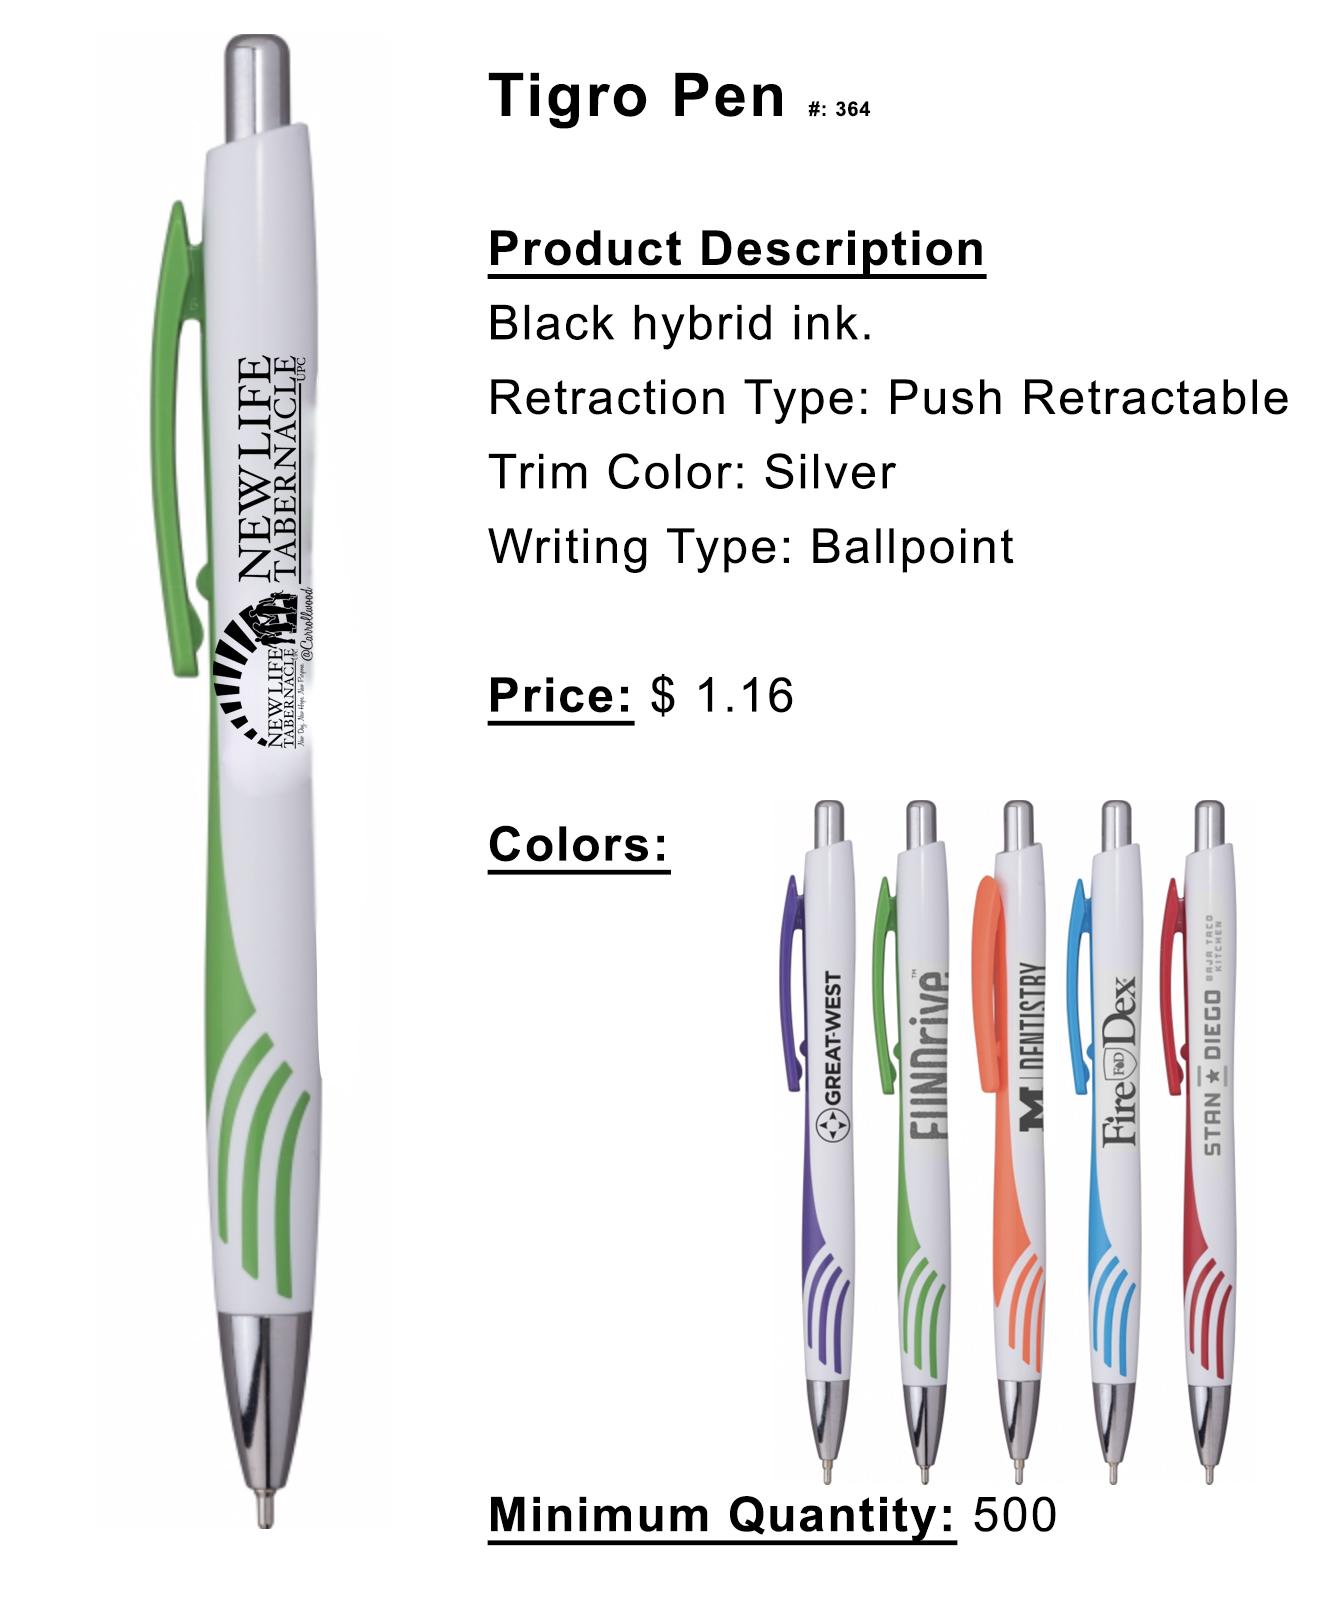 tigro-pen-item-364.jpg